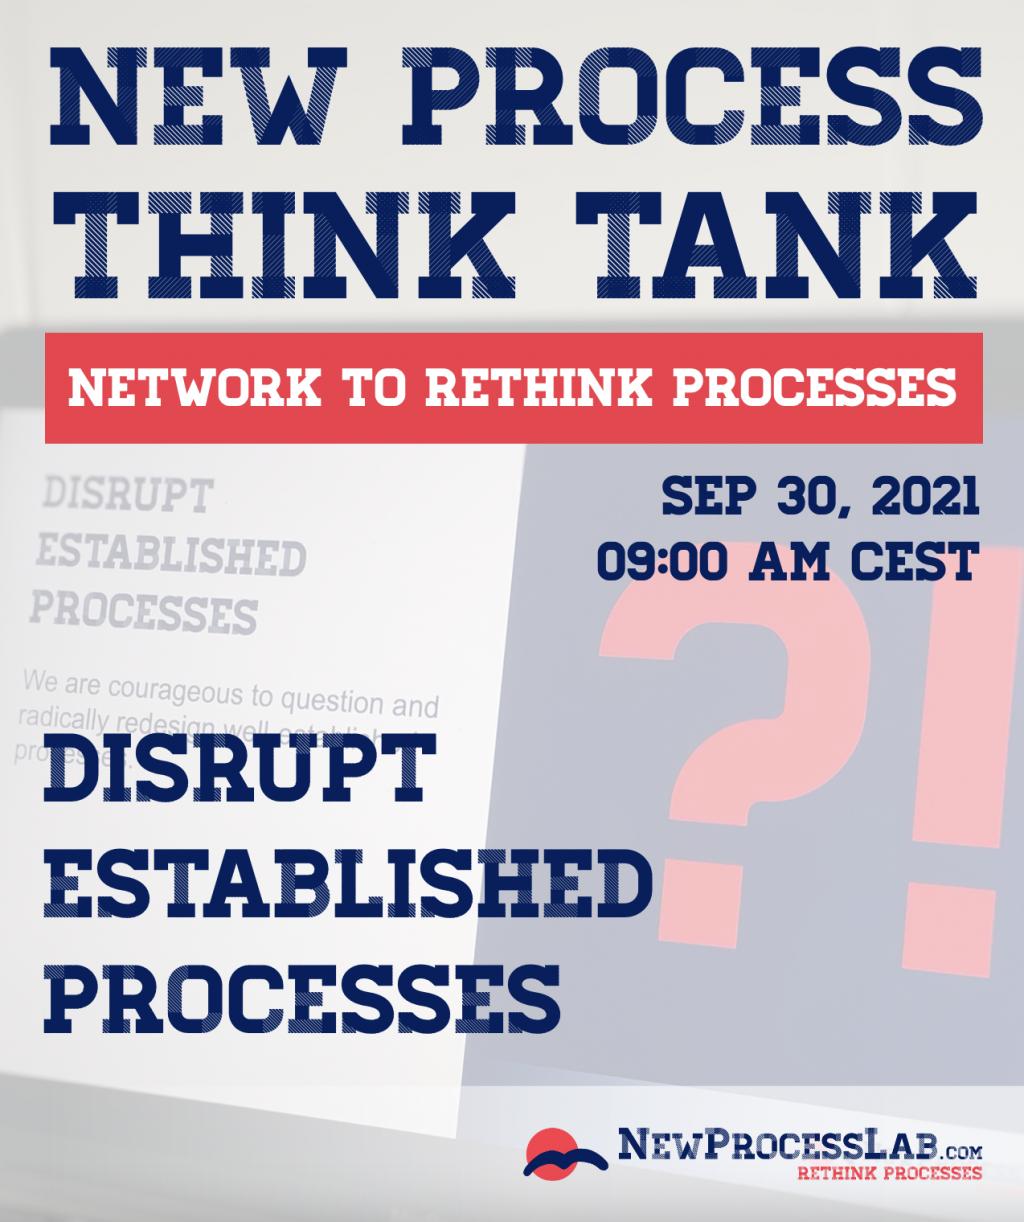 New Process Think Tank